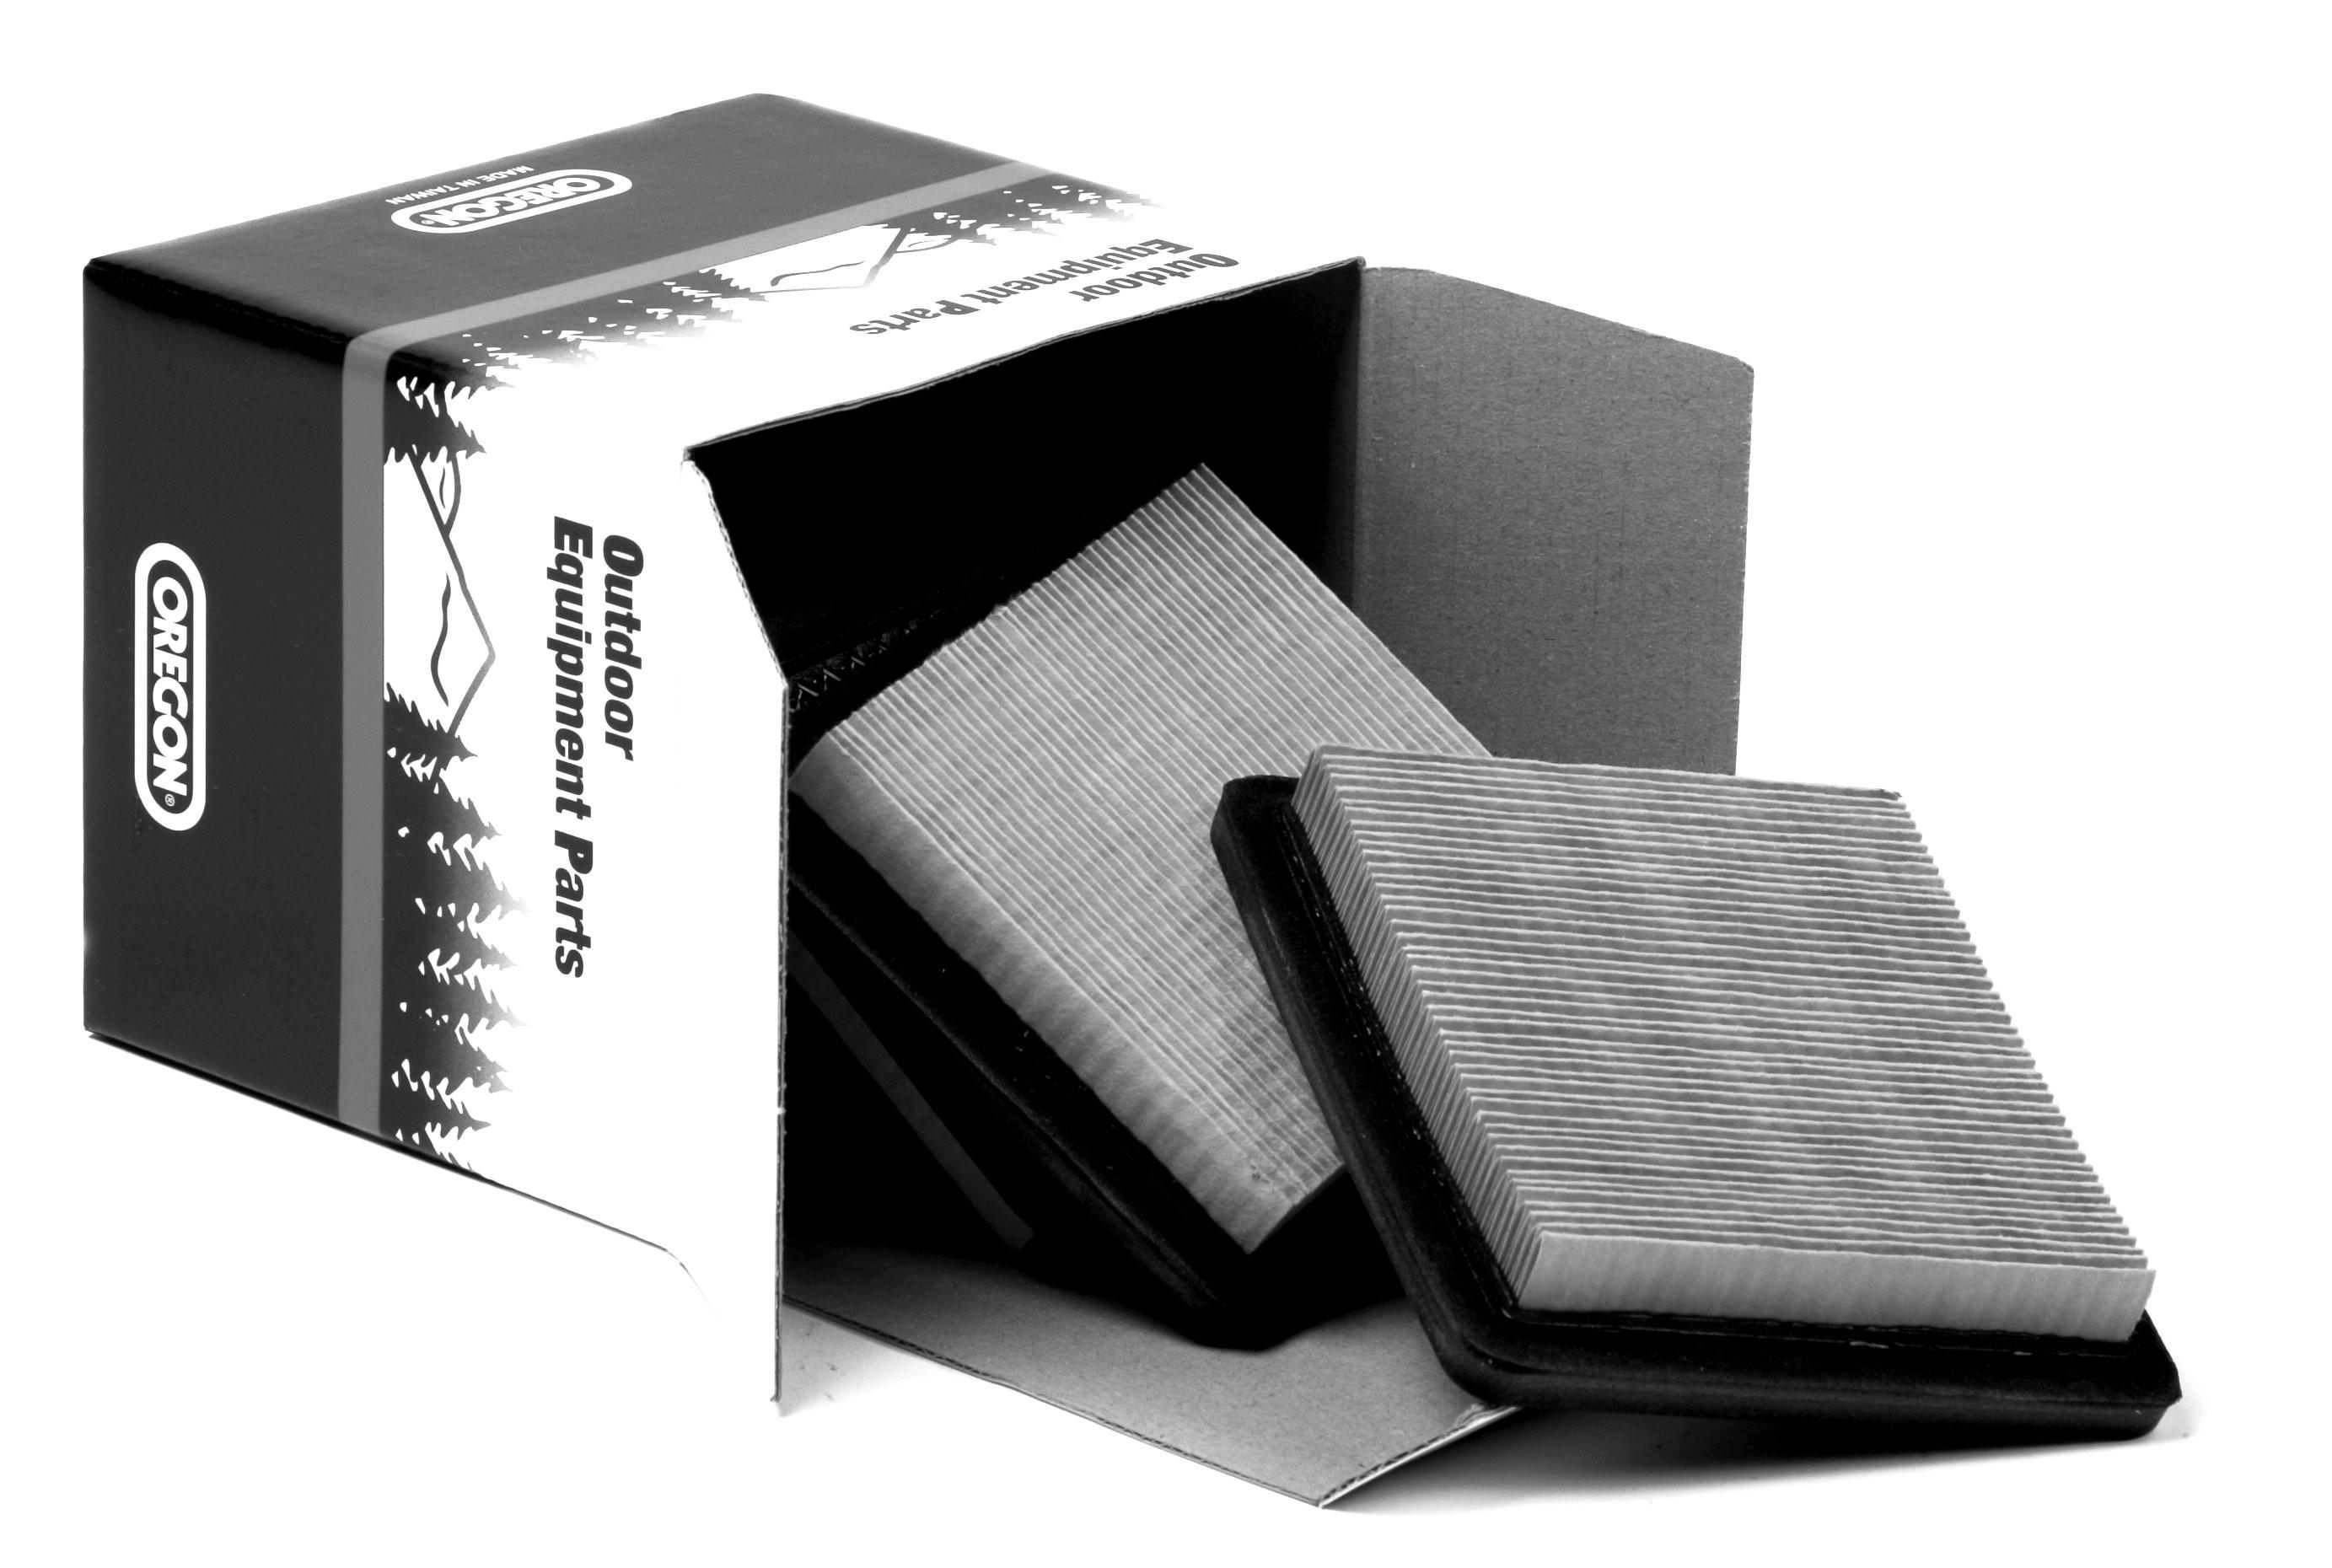 Vzduchový filtr do sekaček s motorem Honda GC/GCV 135 GC/GCV 160 (5 ks)